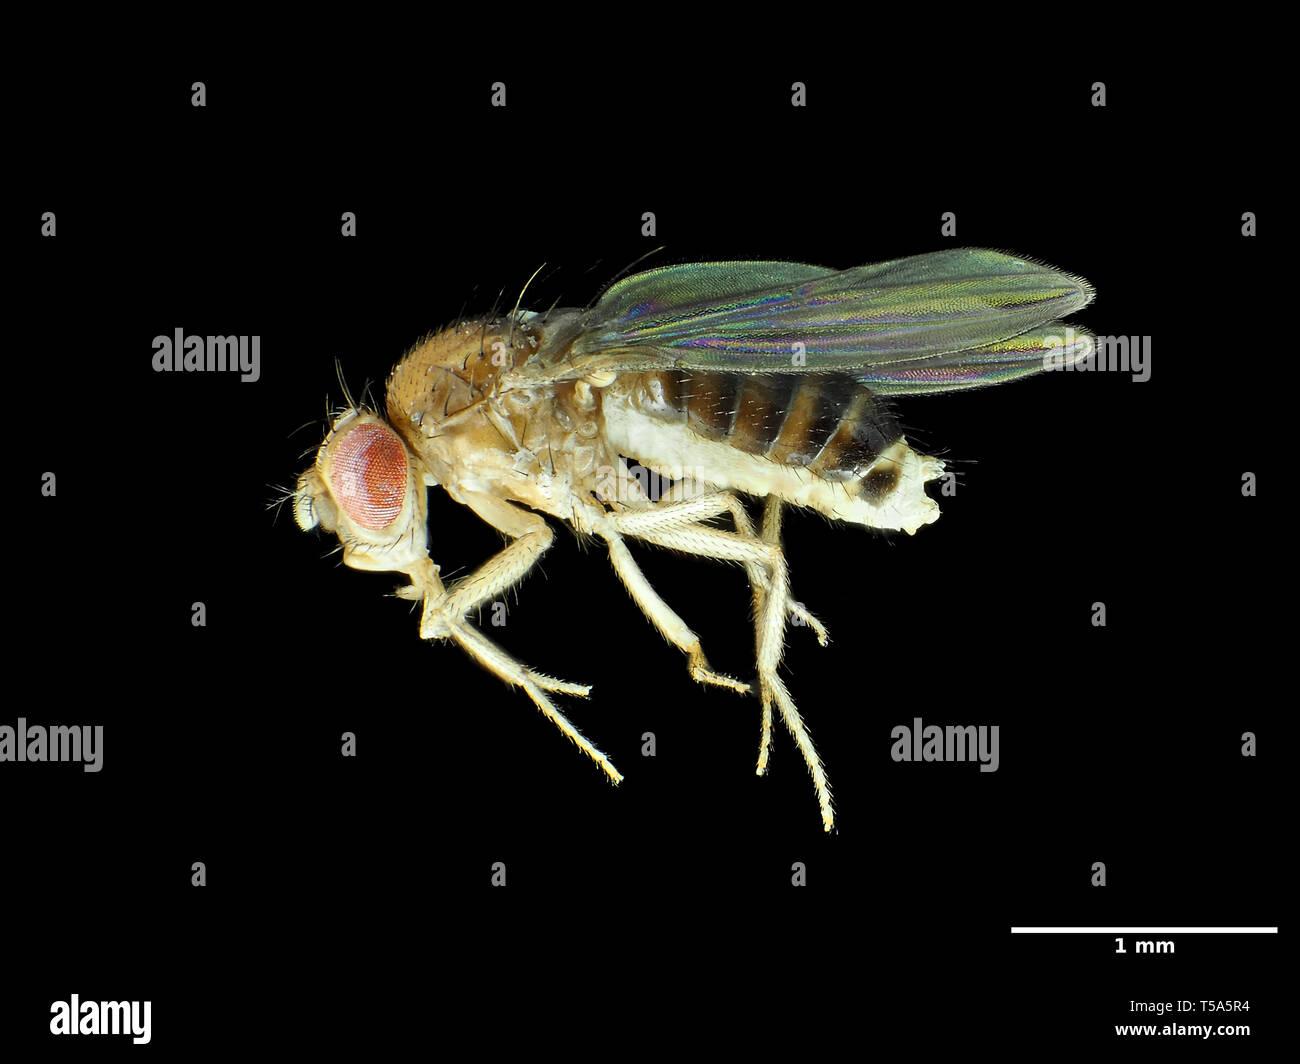 Tiny fruit fly (about 2.5mm in length) Drosophila melanogaster - Stock Image